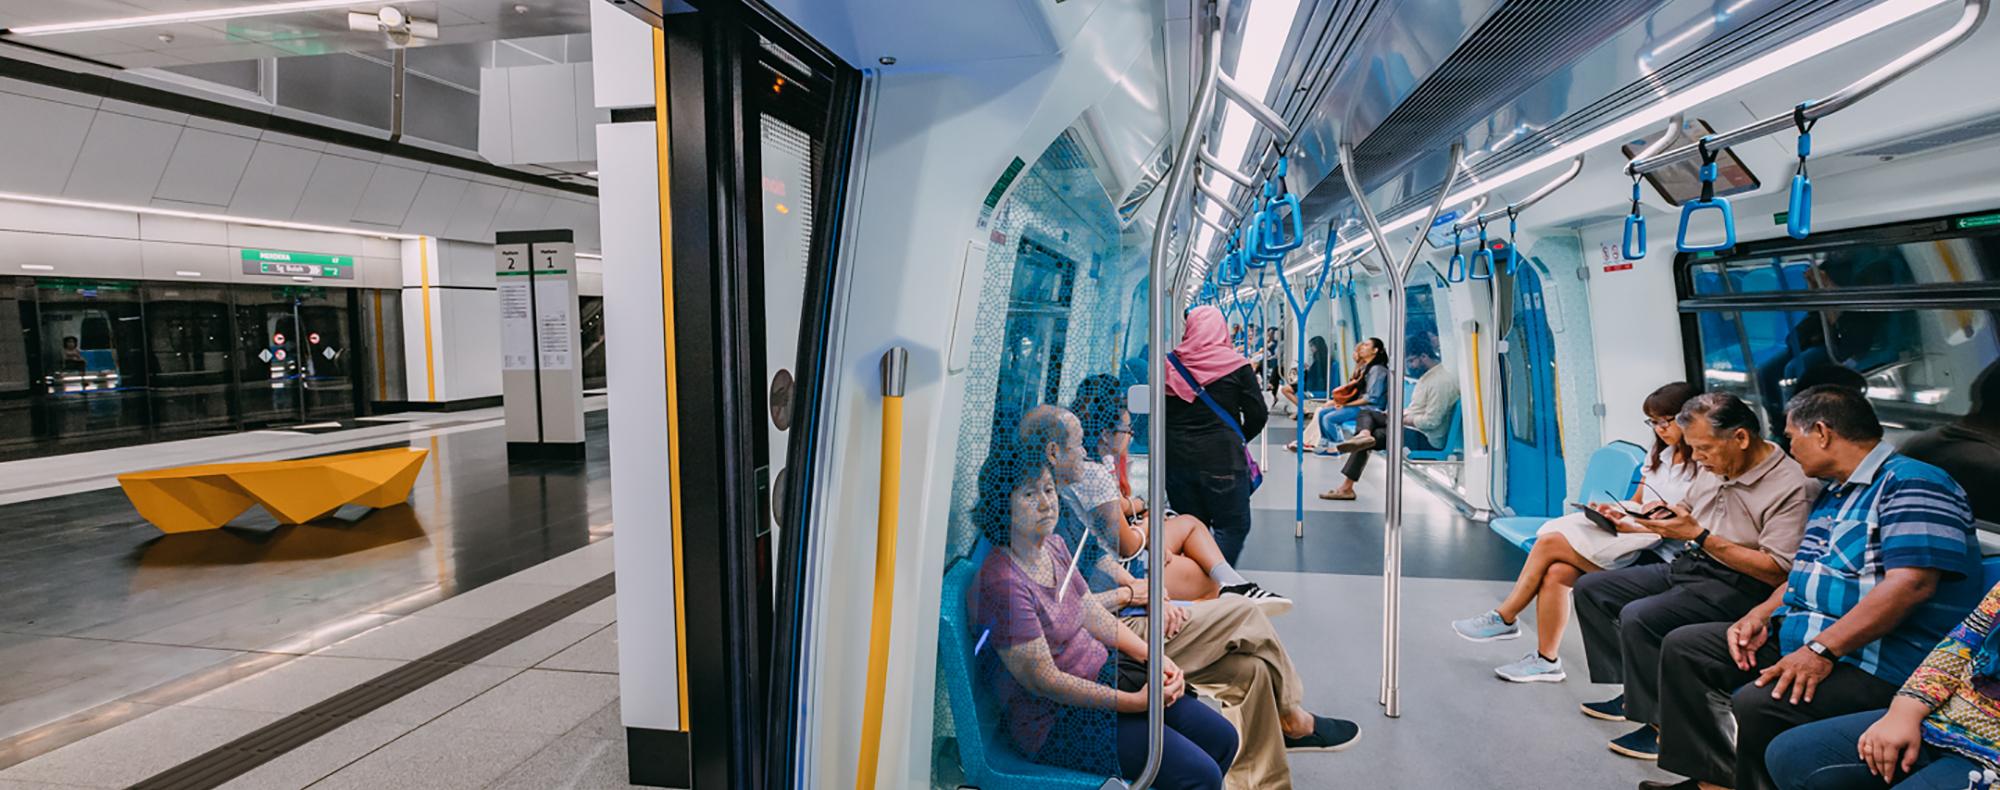 Pembandingan harga MRT dengan negara asia lain